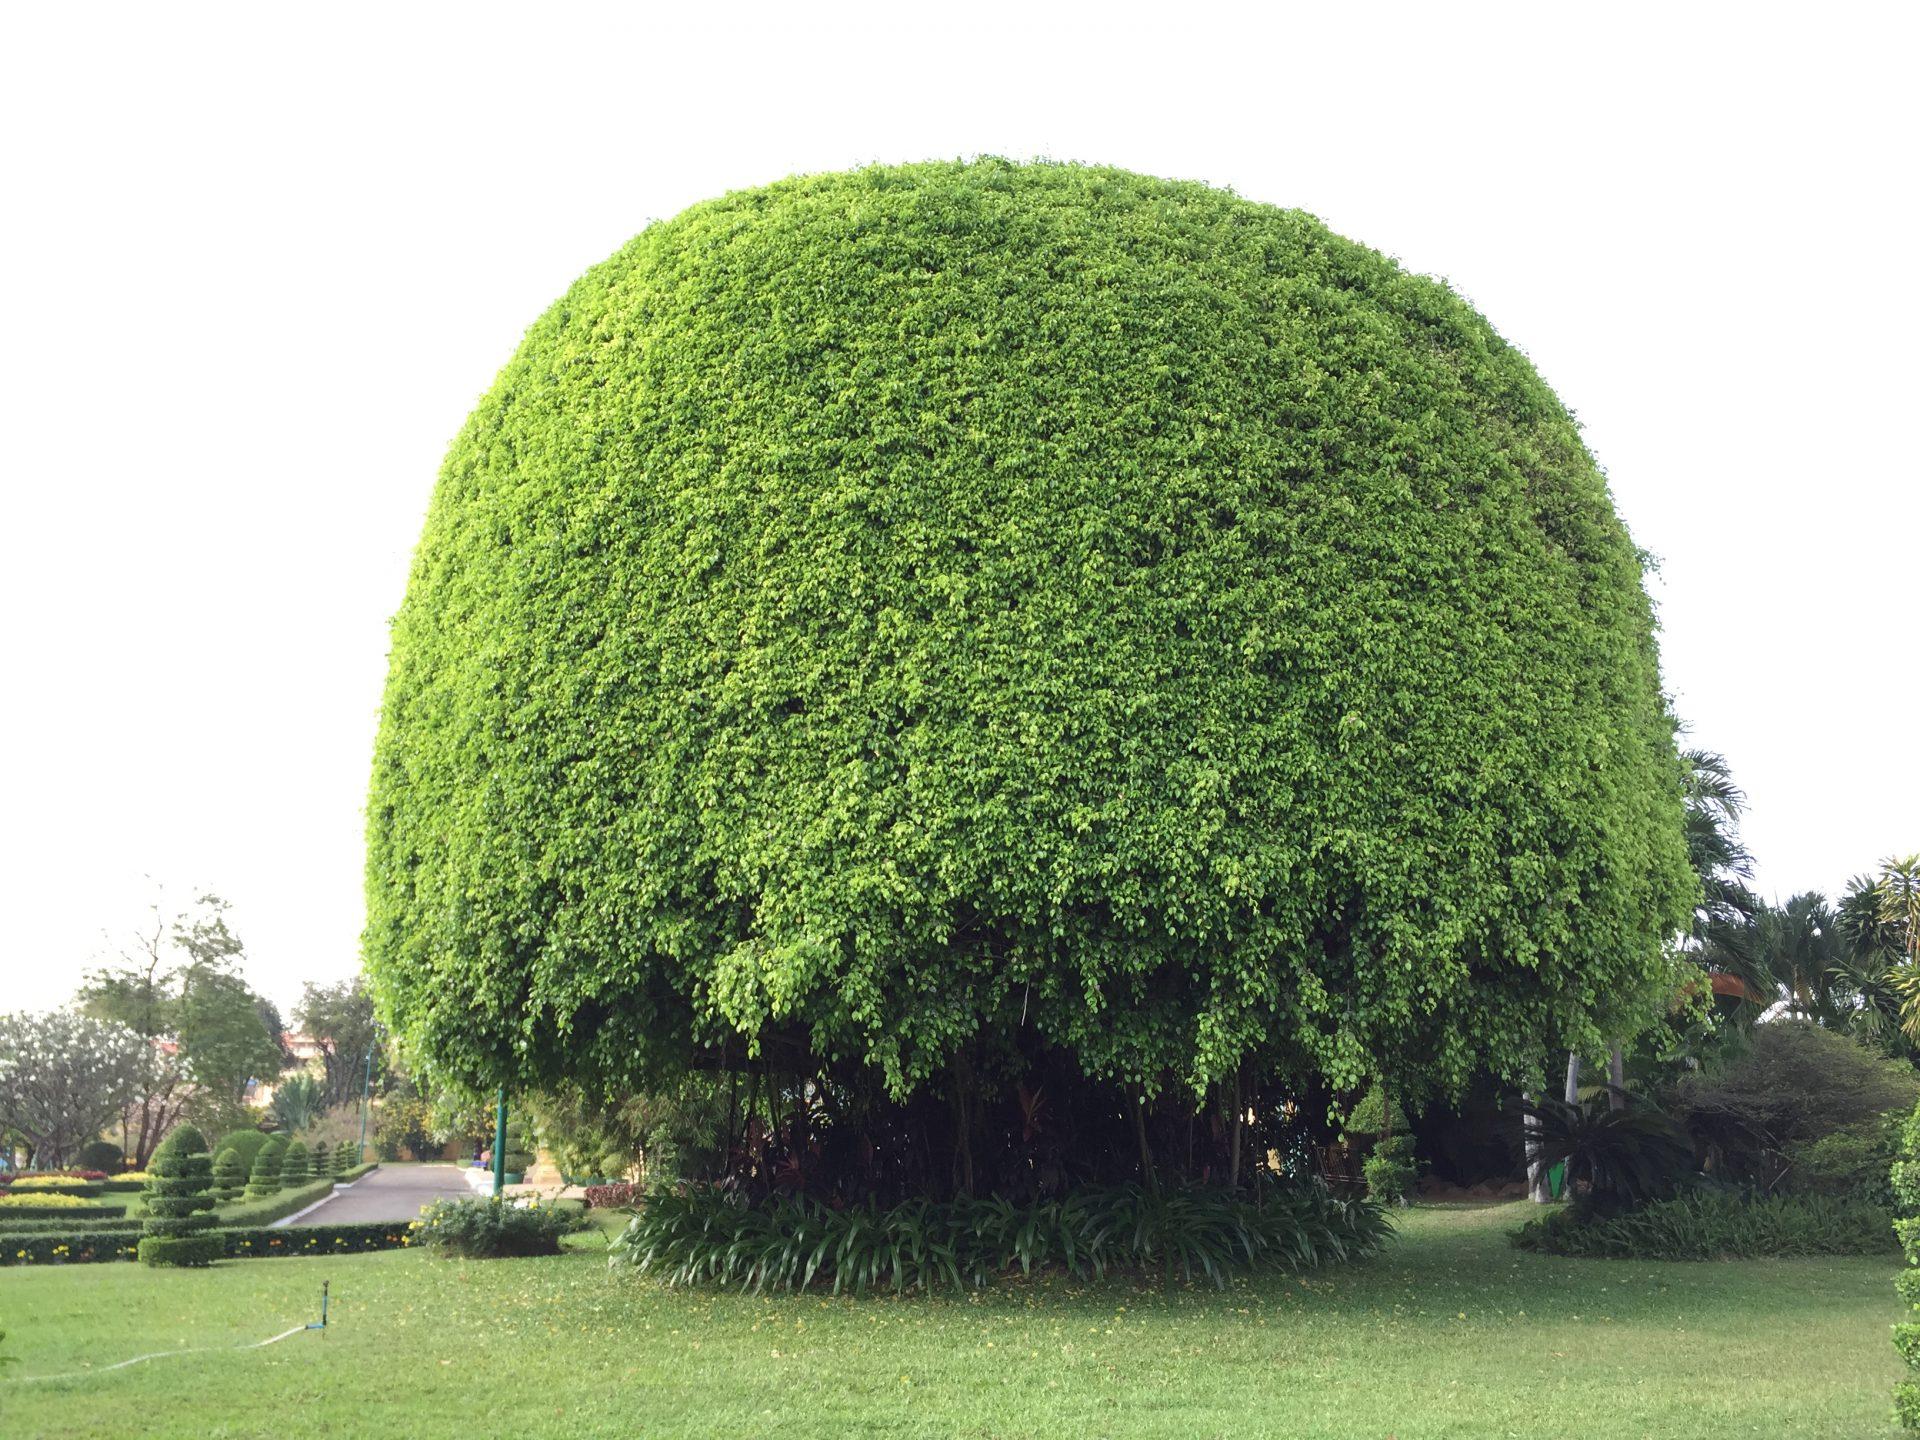 A giant, mushroom-like tree in the King's garden at Phnom Penh